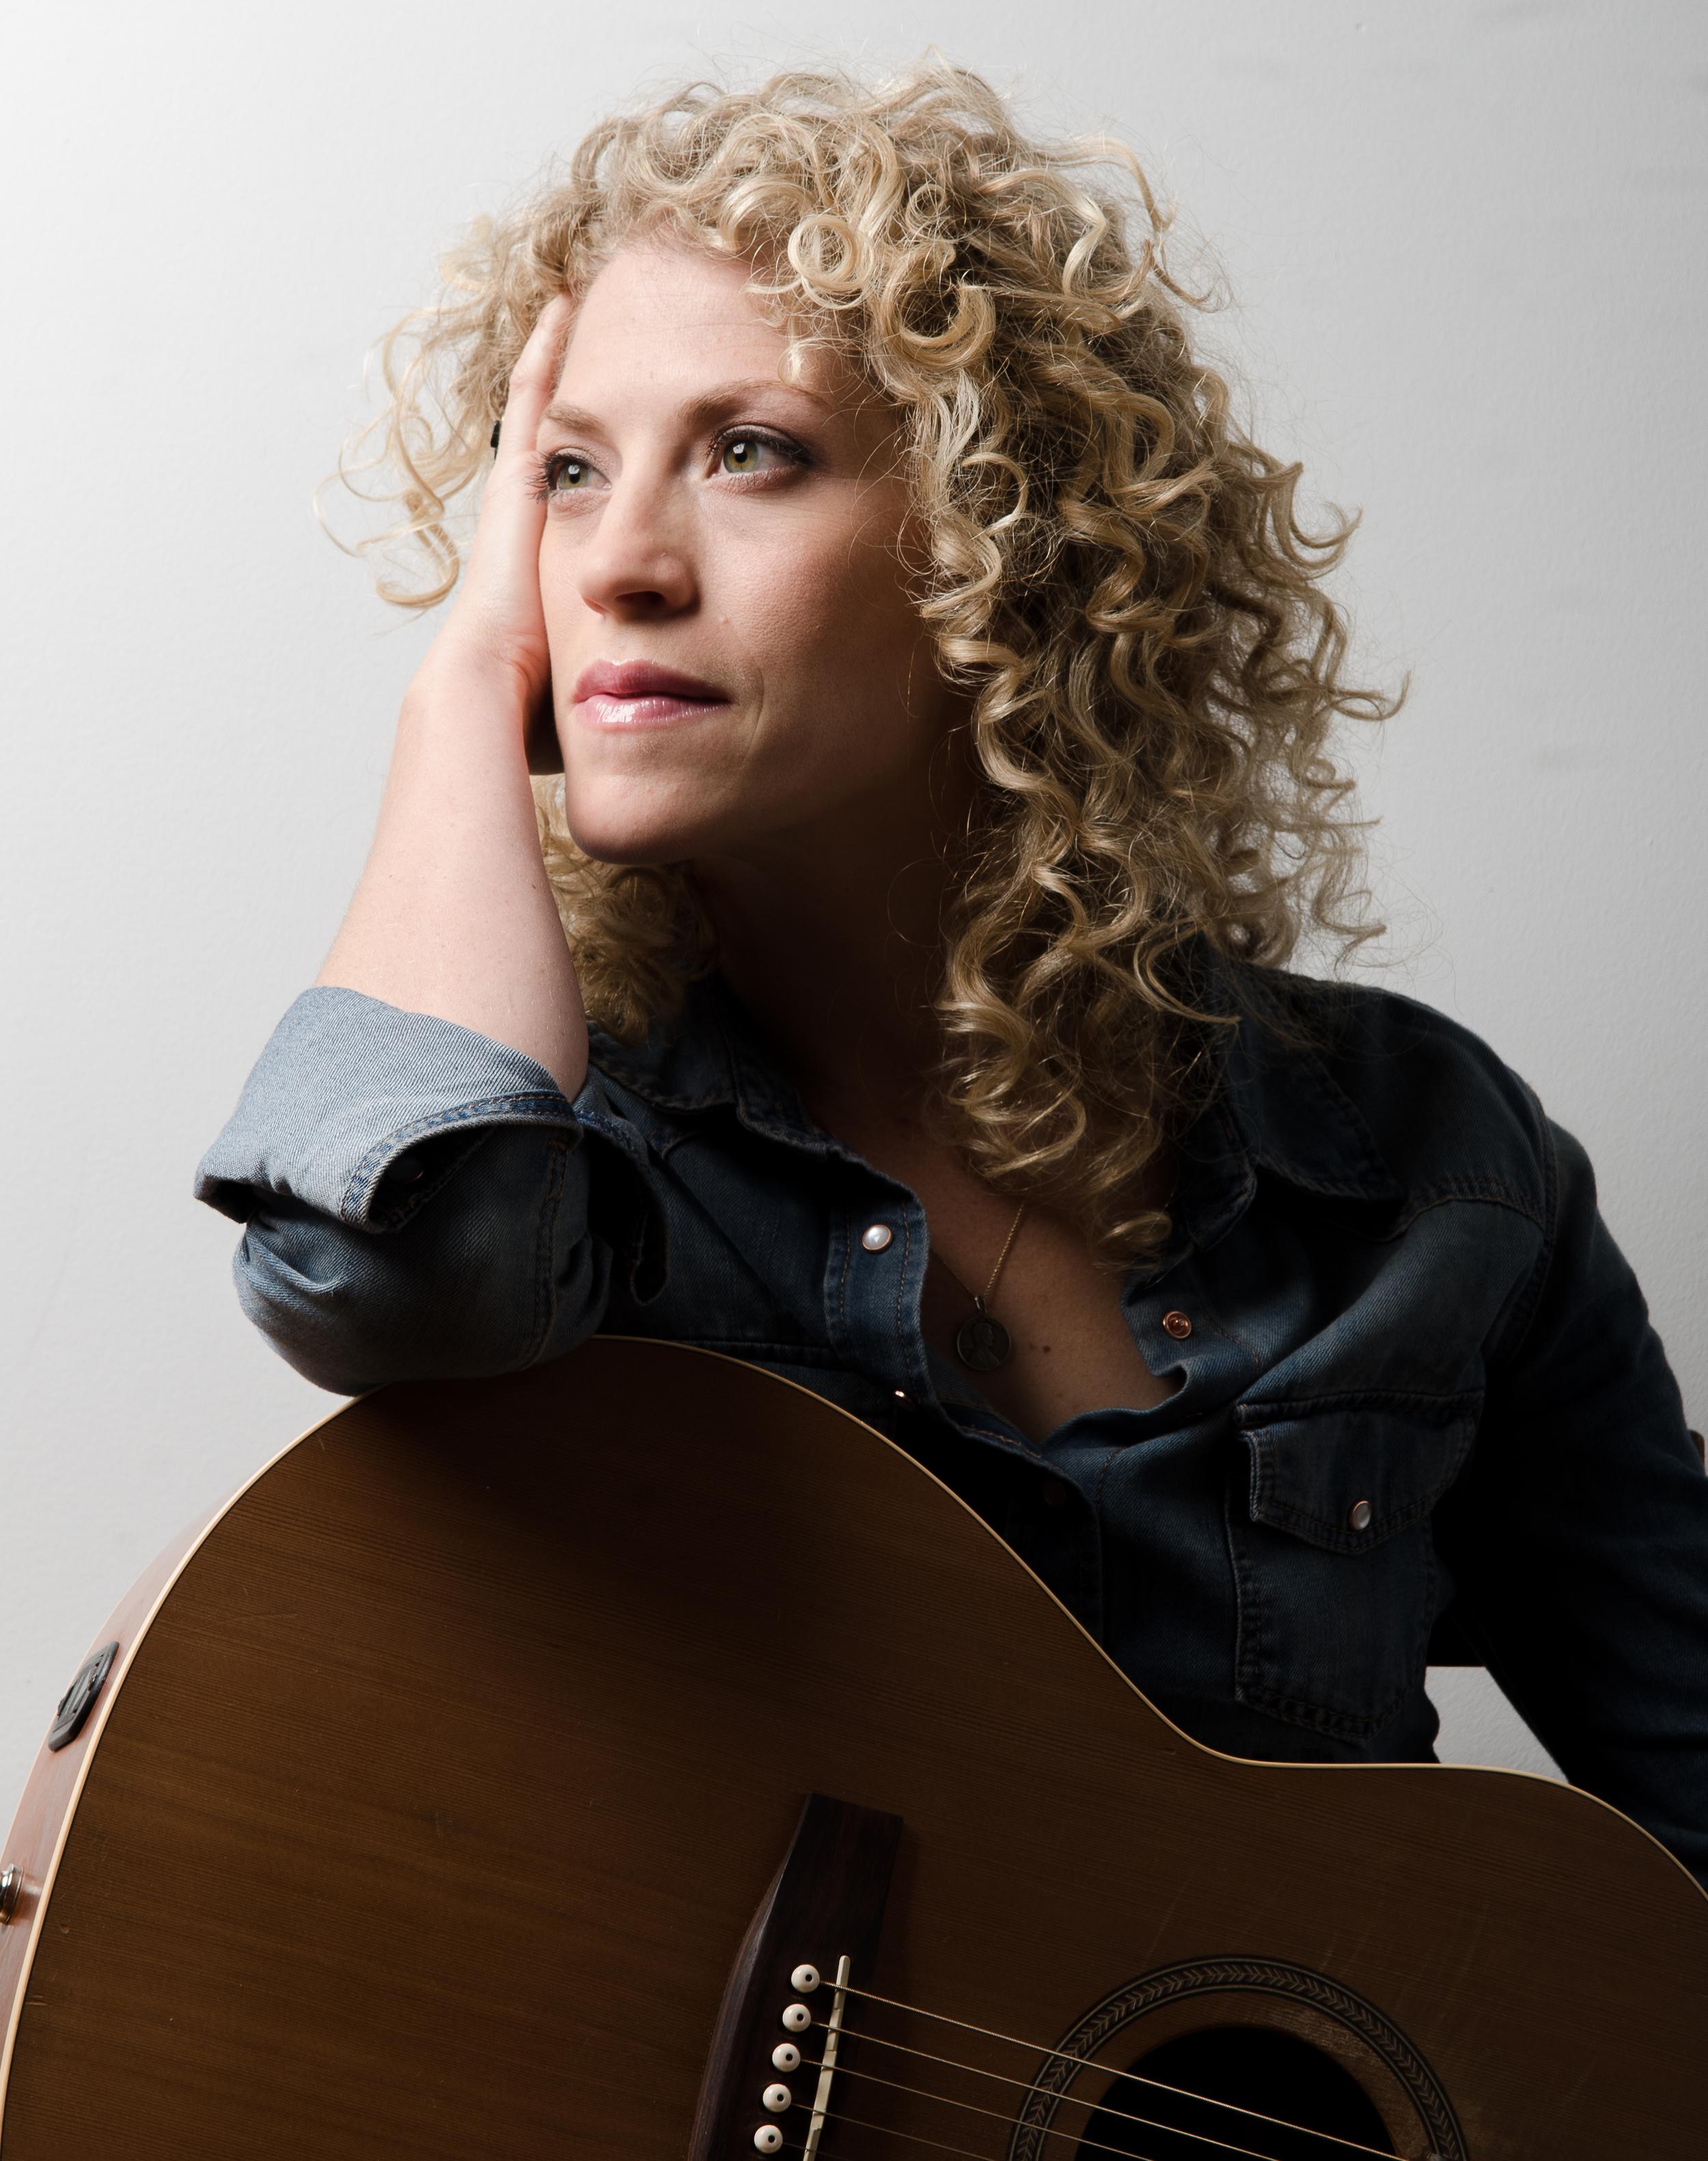 Sarah_Aili_Guitar_Singer_Songwriter_close_up_Briscoe_Savoy_Photography_Nashville.jpg